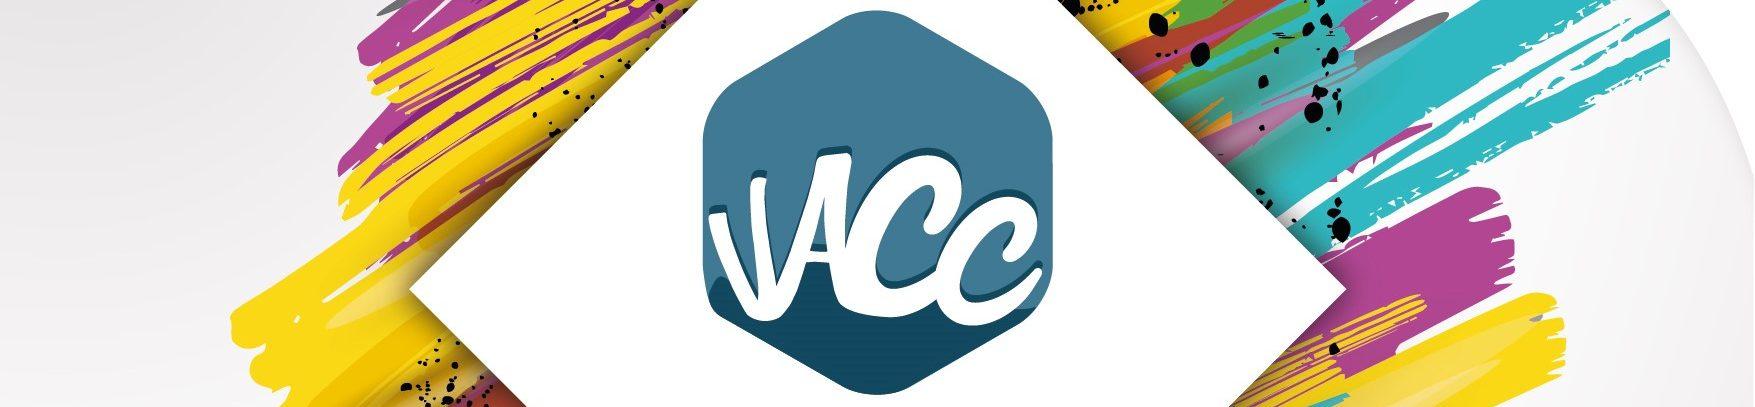 VACC 2021Bem-vindos